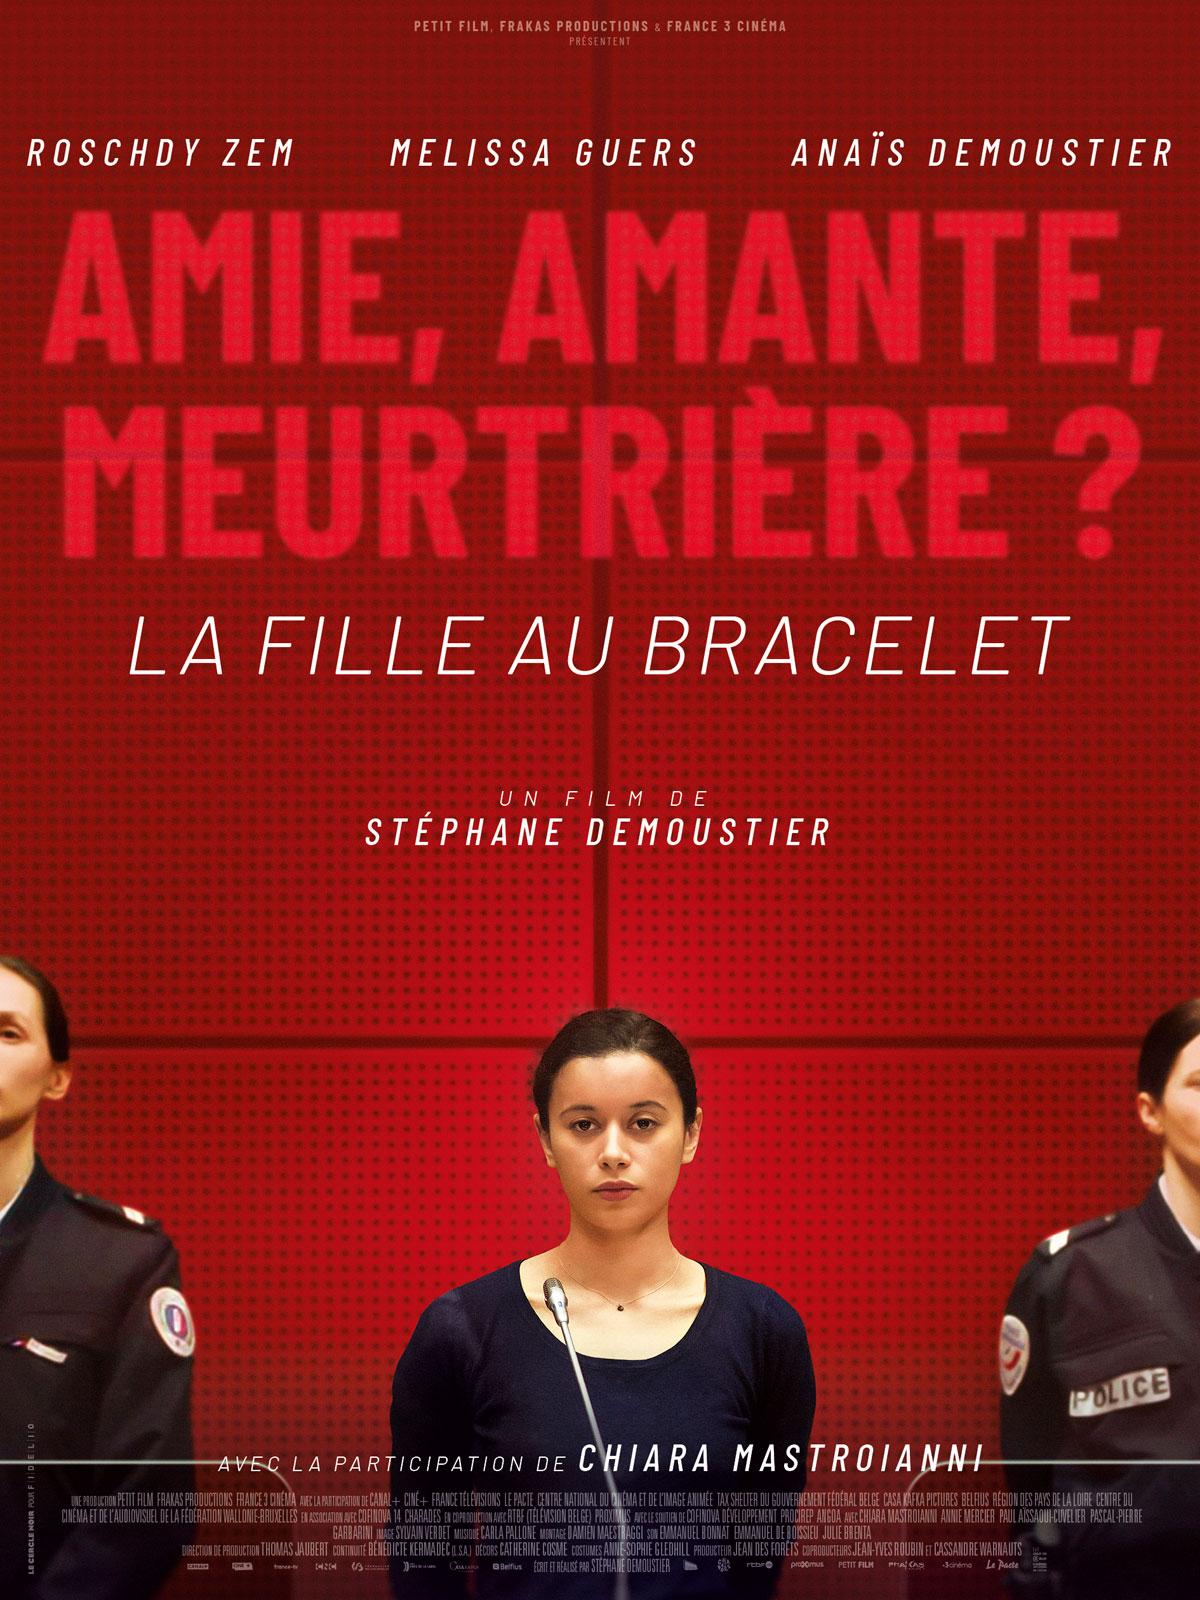 http://rss.allocine.fr/~r/ac/cine/cettesemaine/~3/F3zIEMcfzzE/fichefilm_gen_cfilm=262182.html